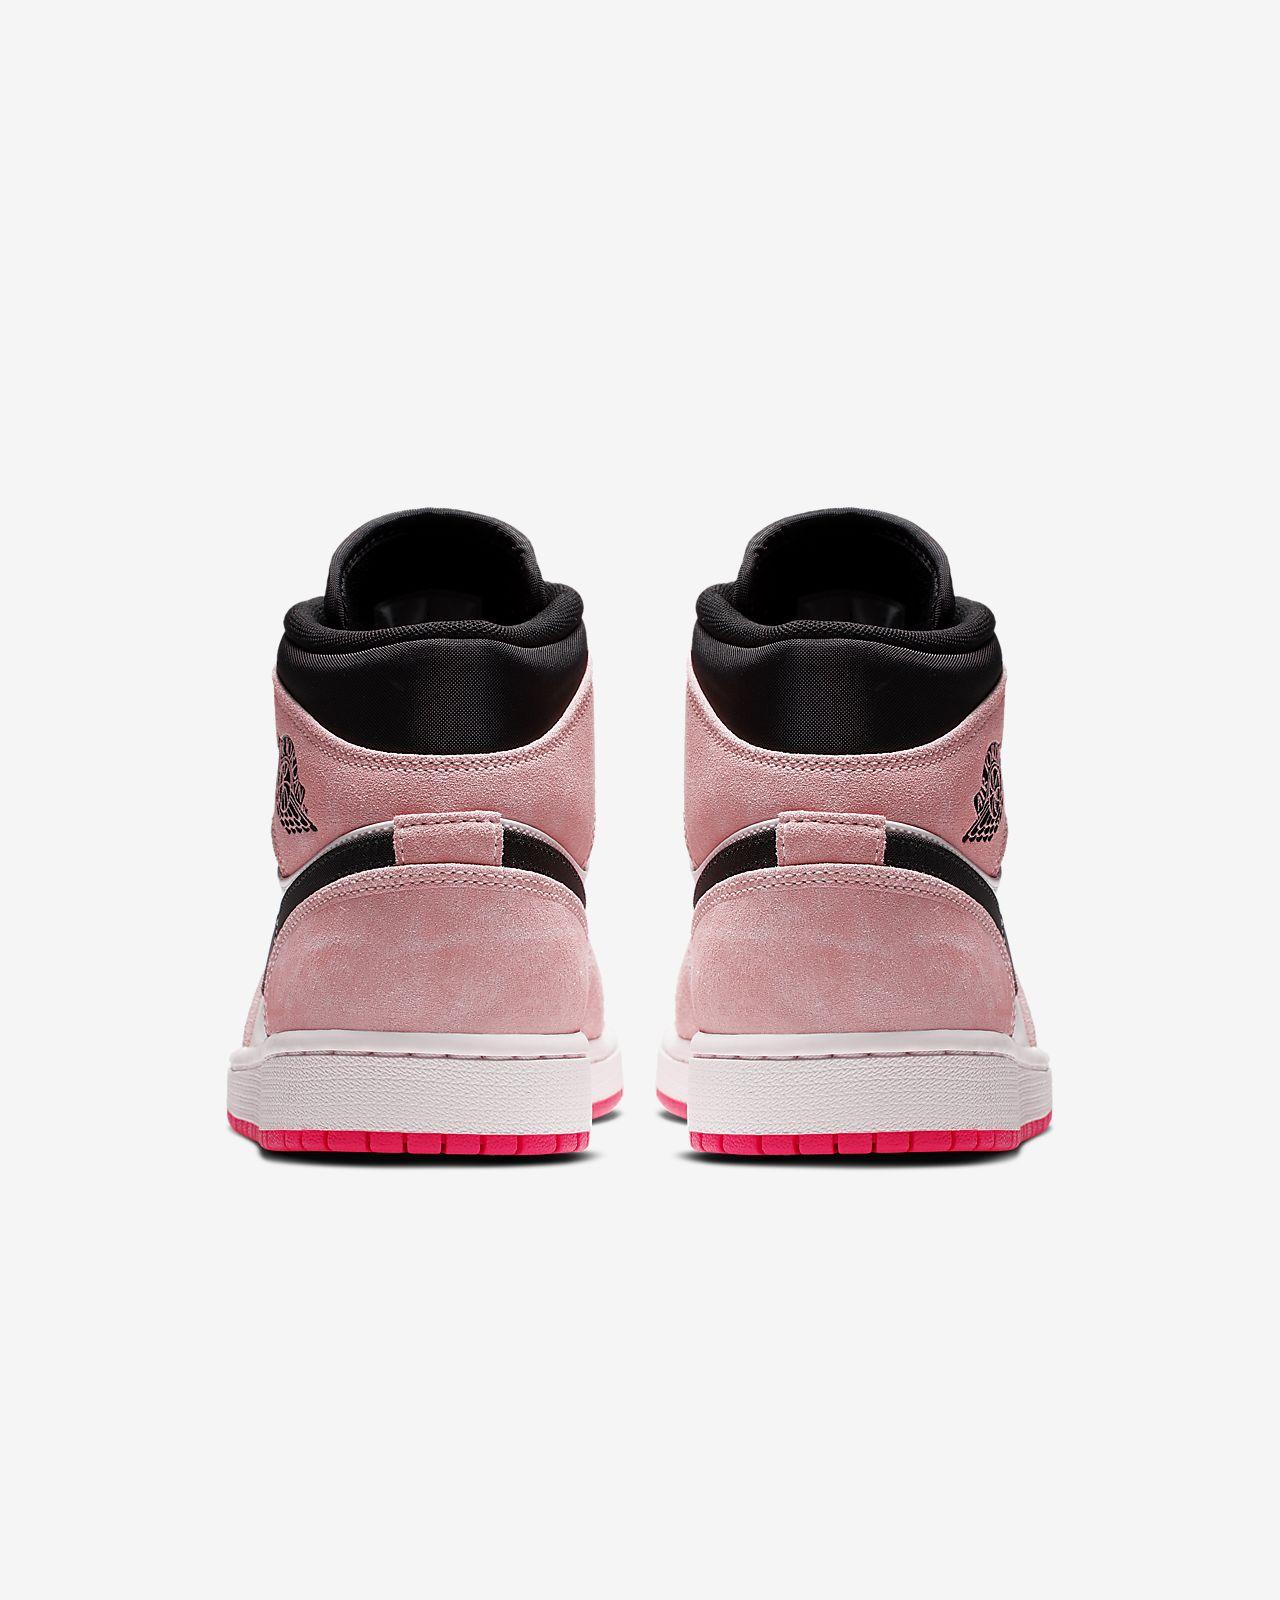 san francisco 49e2d 5e49f ... Air Jordan 1 Mid SE Men s Shoe